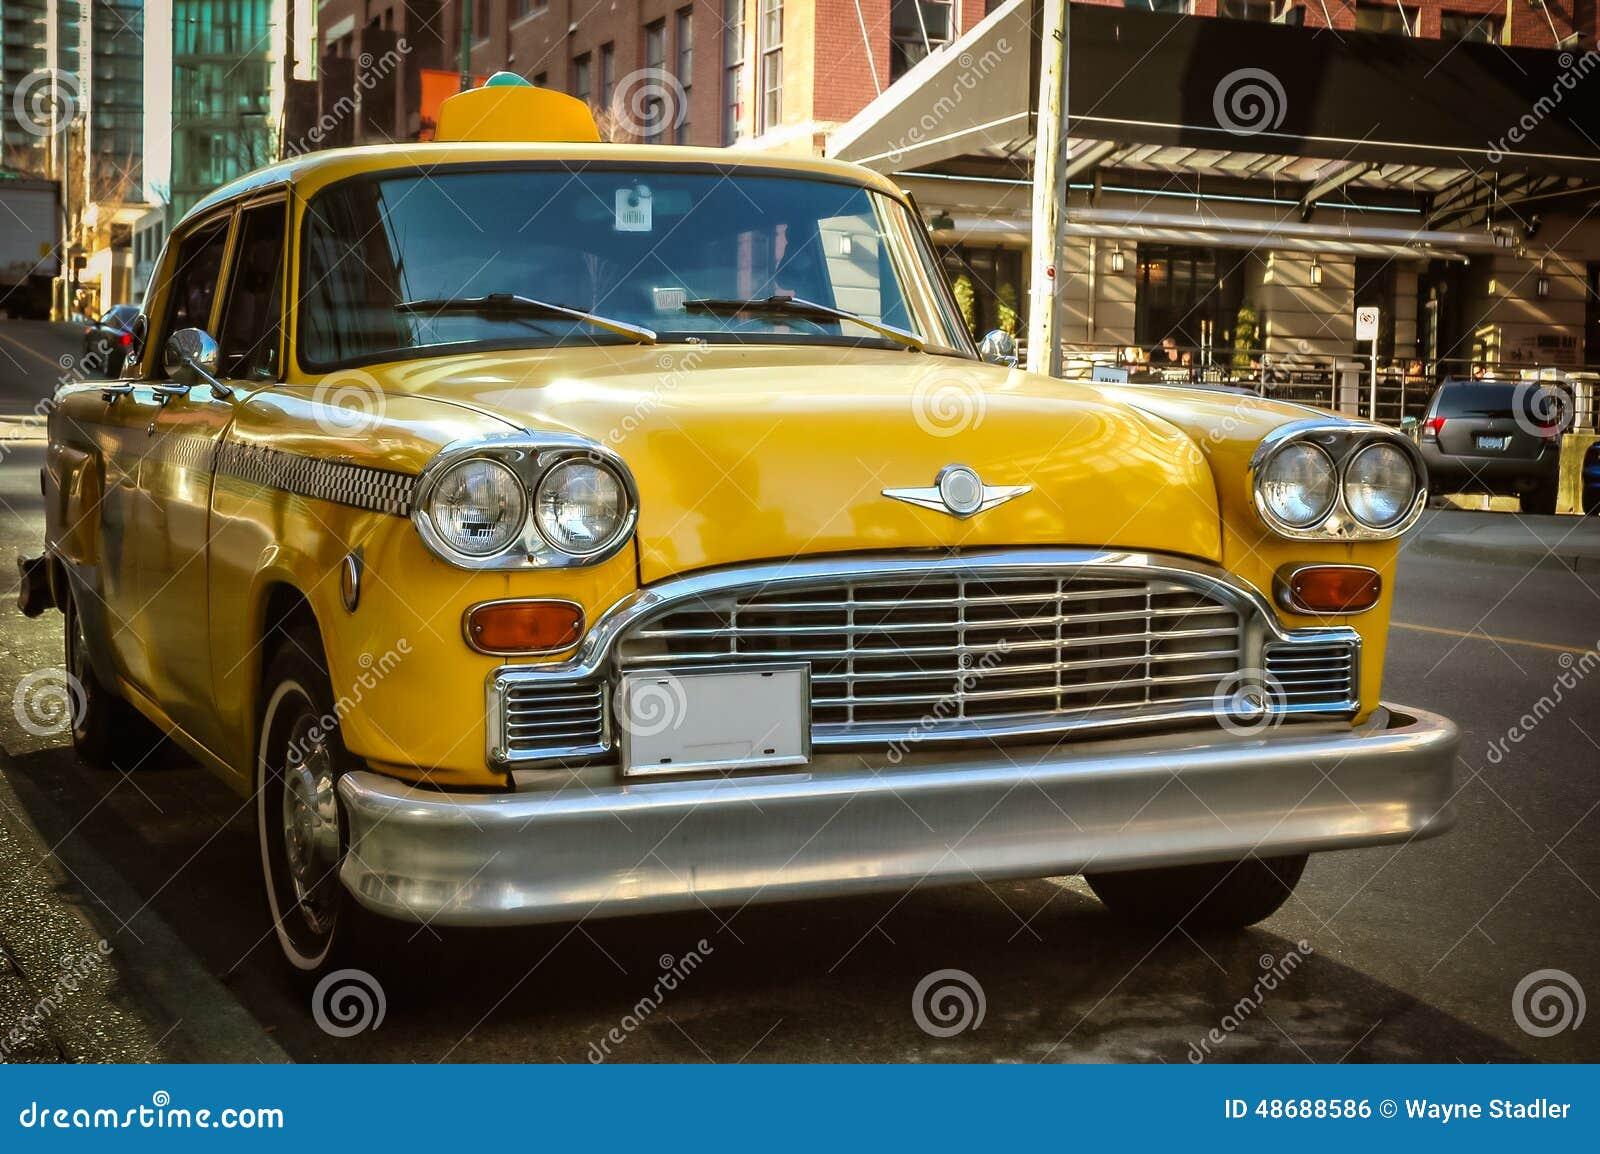 Retro Taxi Cab stock photo. Image of